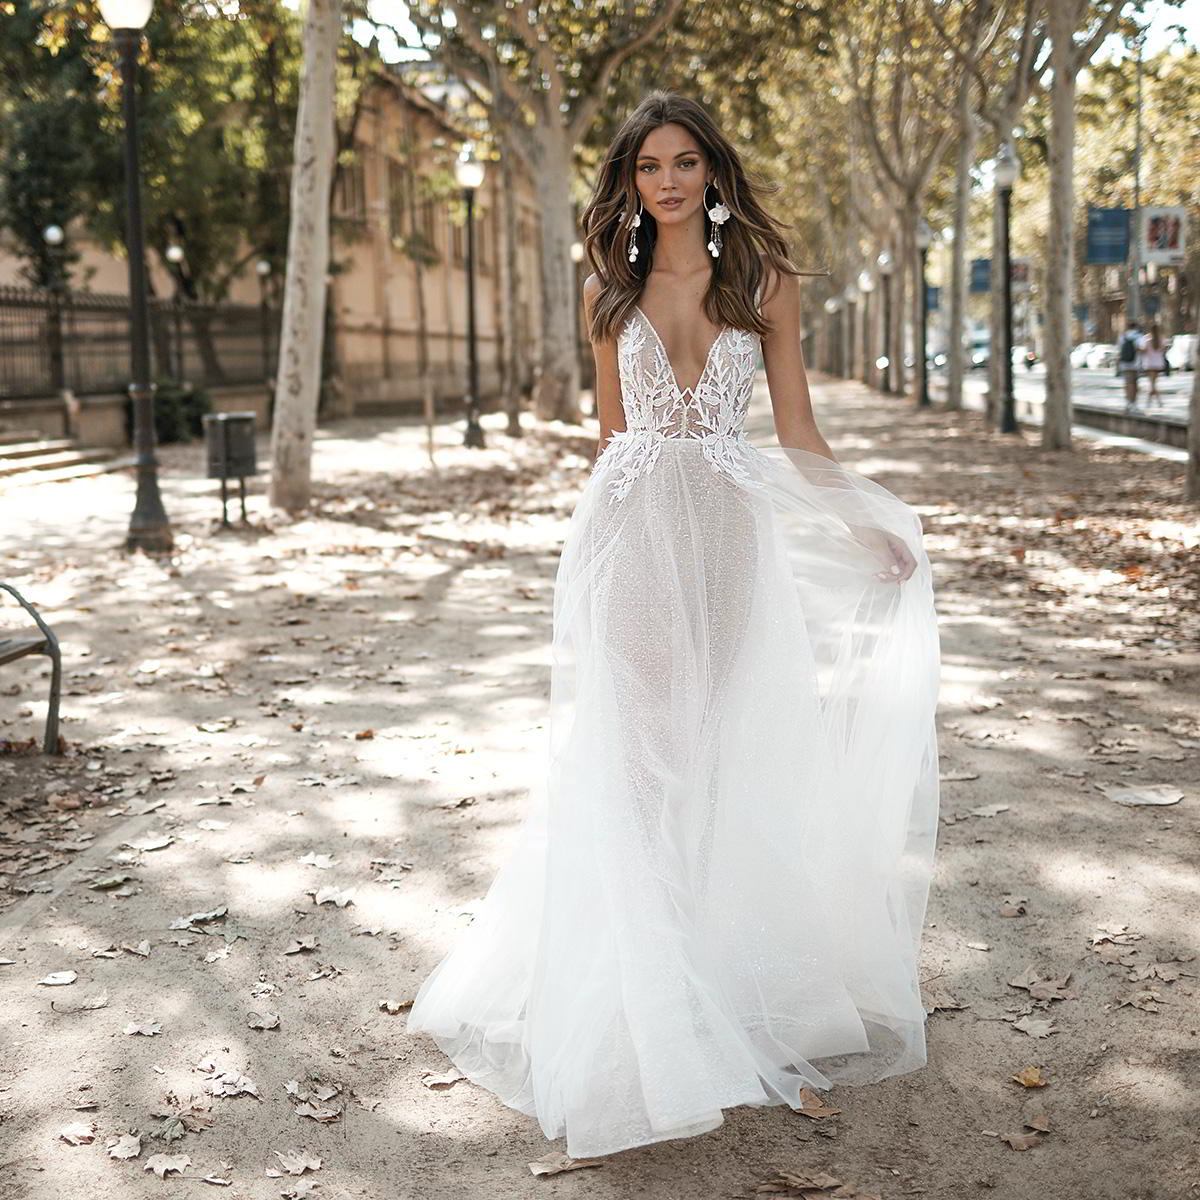 Berta Wedding Dresses.Muse By Berta 2019 Barcelona Wedding Dresses Wedding Inspirasi